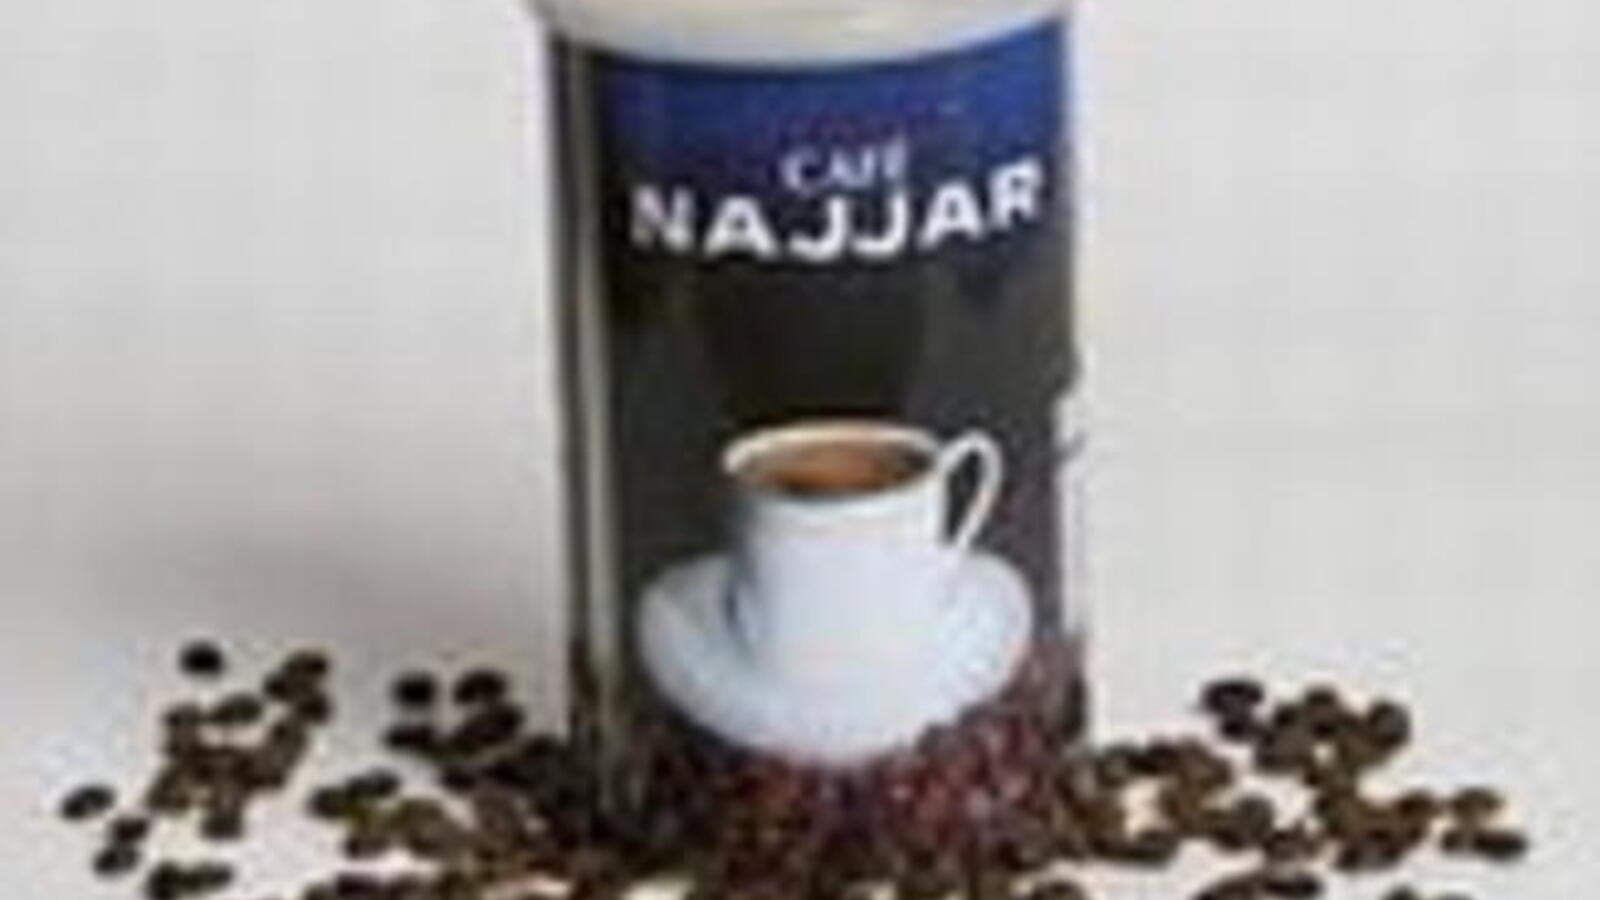 Nader Group becomes sole distributor of Café Najjar in